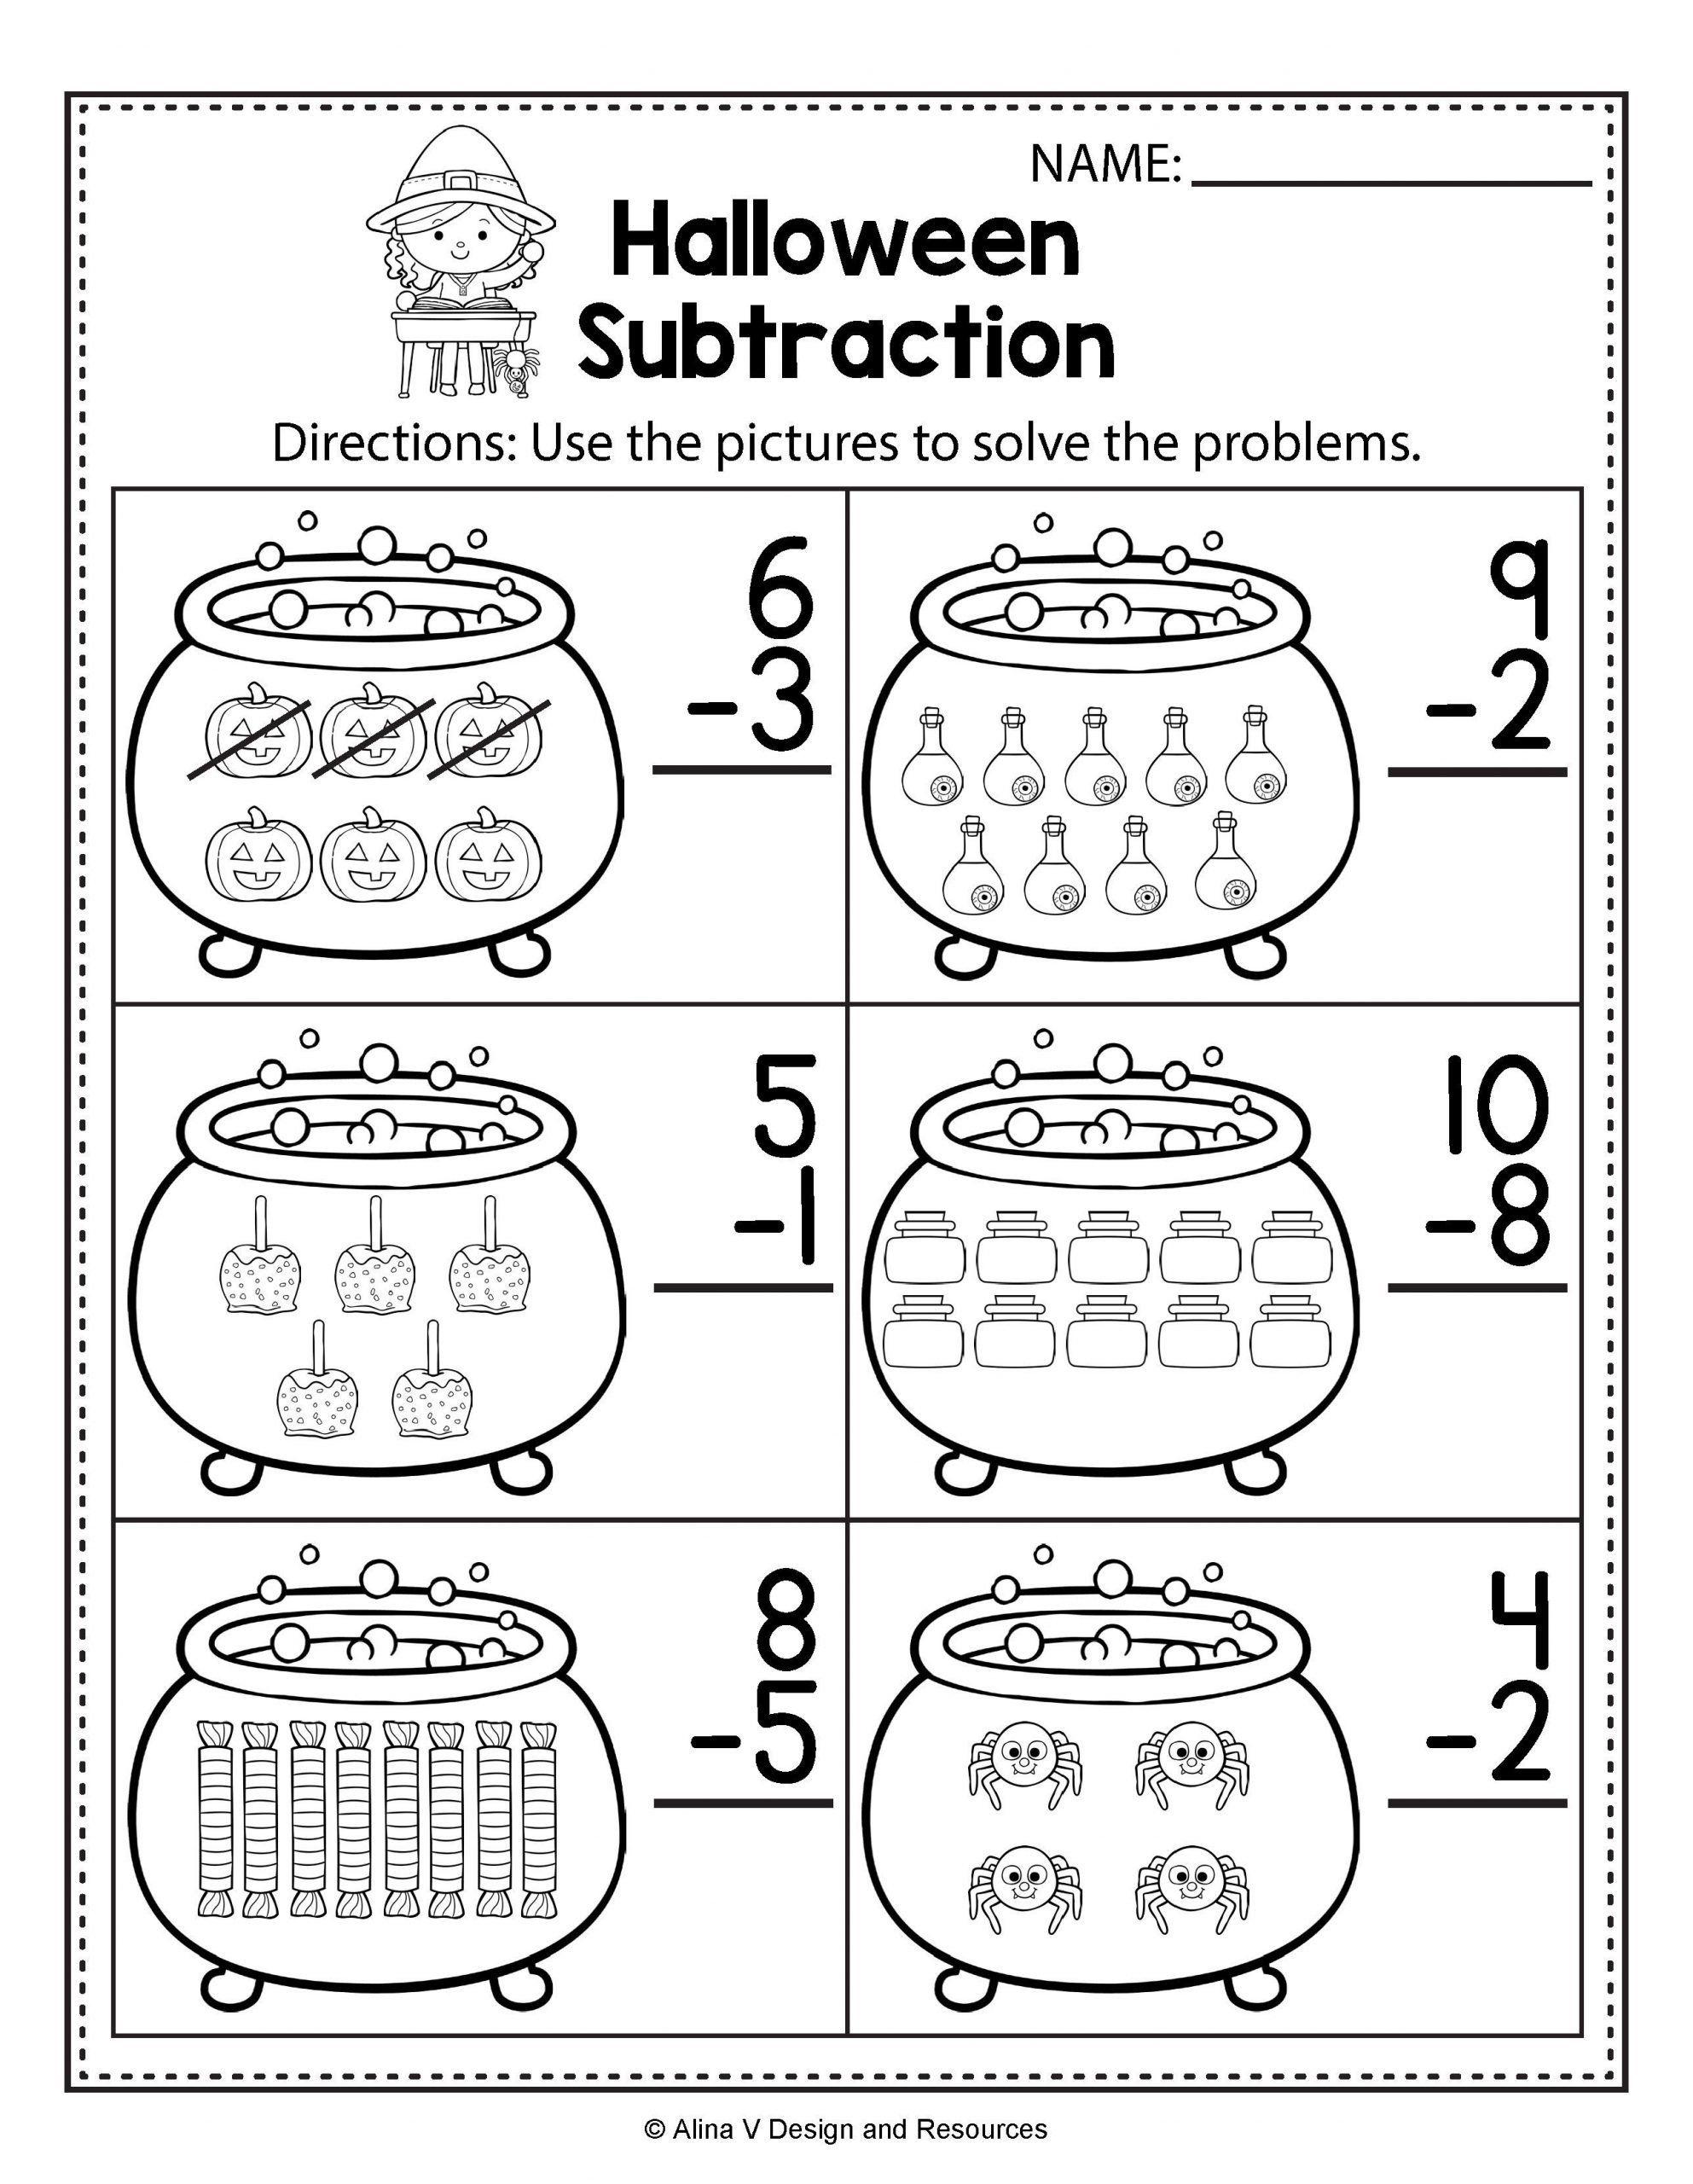 Halloween Worksheets For First Grade Halloween Math Literacy Activities For Kindergar In 2020 Math Literacy Activities Halloween Math Worksheets Kids Math Worksheets